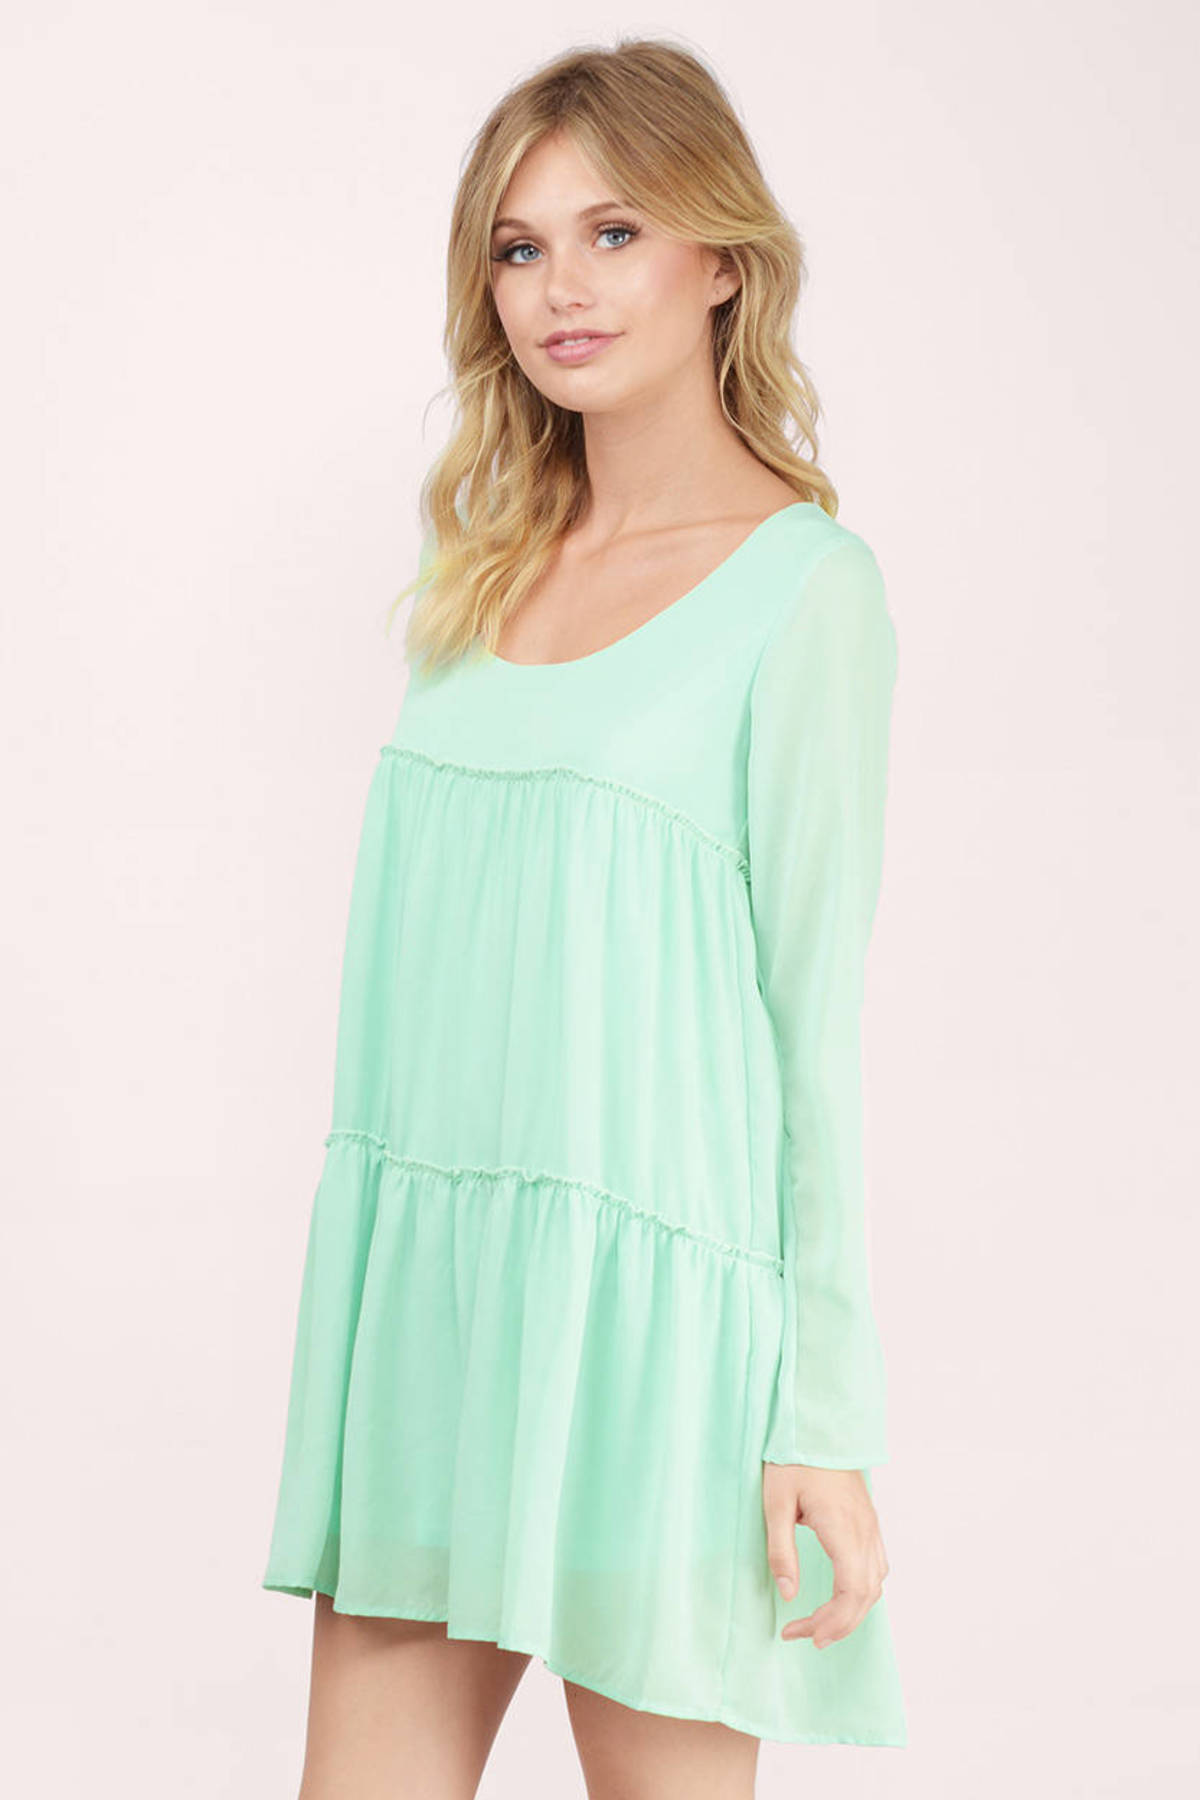 Wedding Mint Green Dresses mint green dresses sundress color dress tobi tier she goes again shift dress